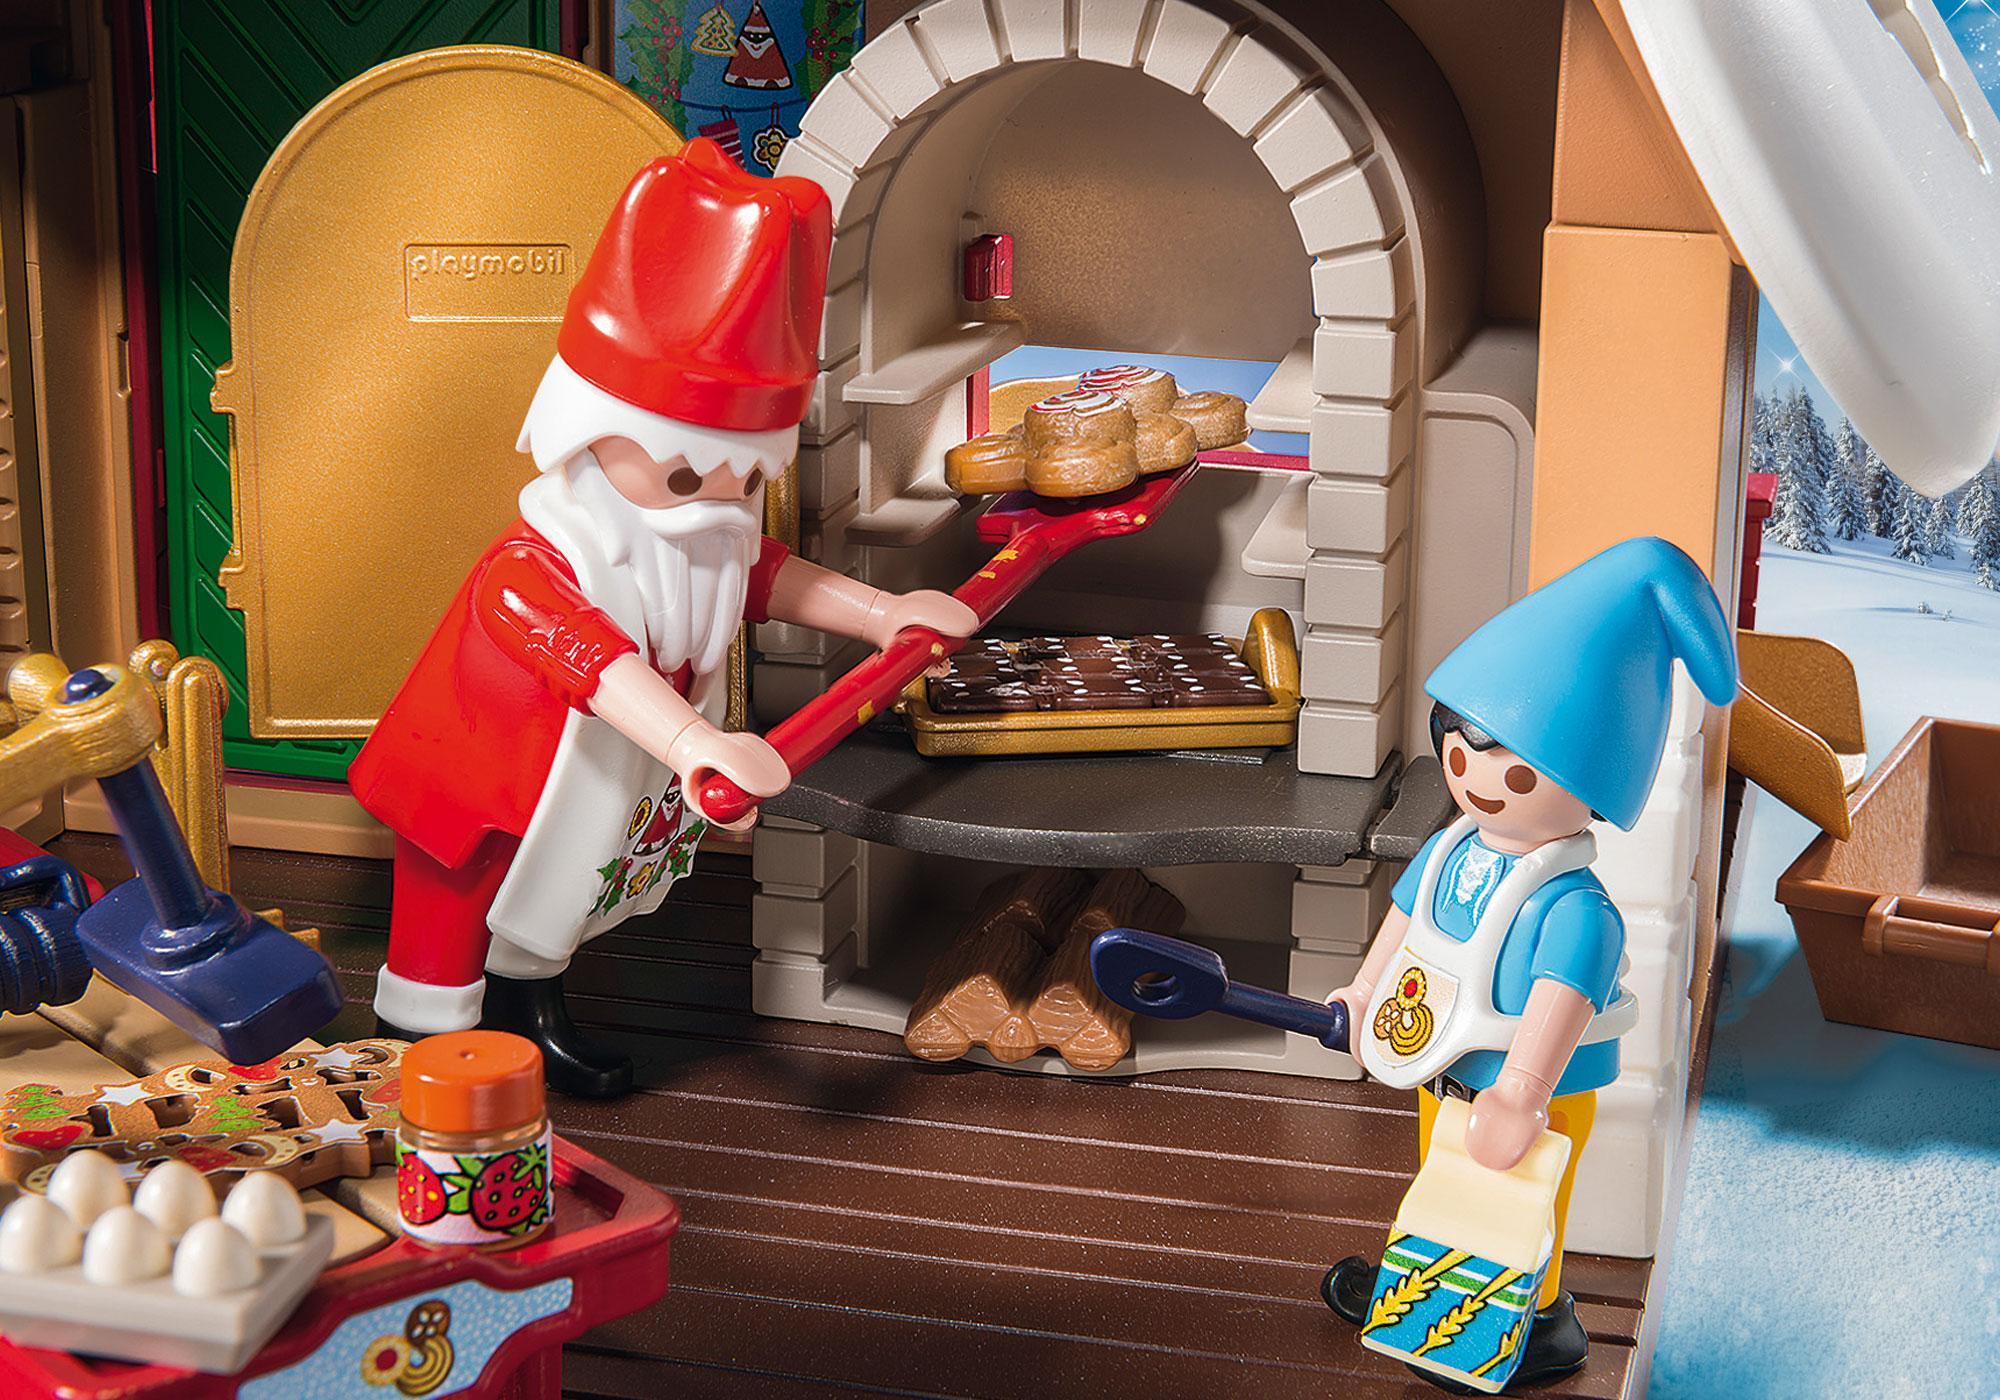 http://media.playmobil.com/i/playmobil/9493_product_extra1/Weihnachtsbäckerei mit Plätzchenformen